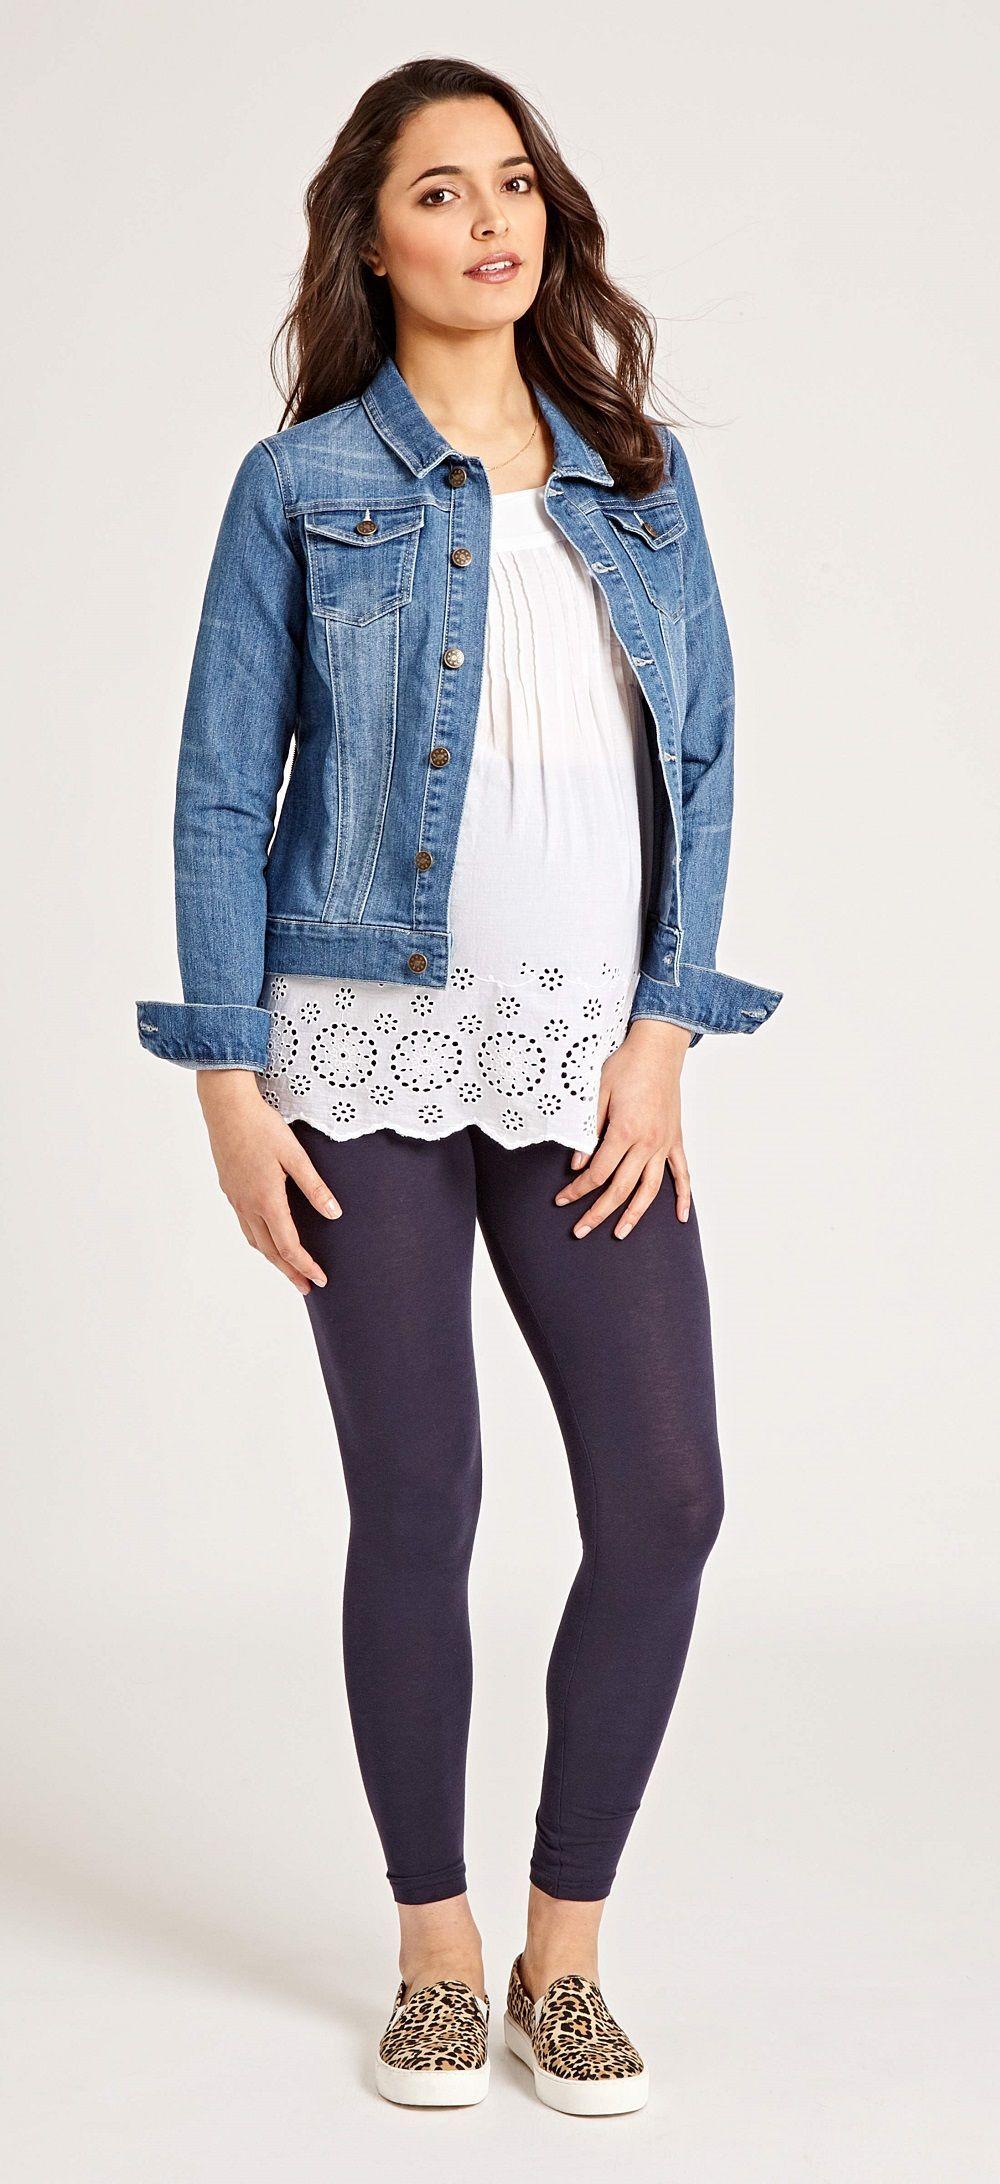 622b4dc646409 JoJo Maman Bebe - Maternity capsule wardrobe, 9 pieces for 9 months! # pregnancy